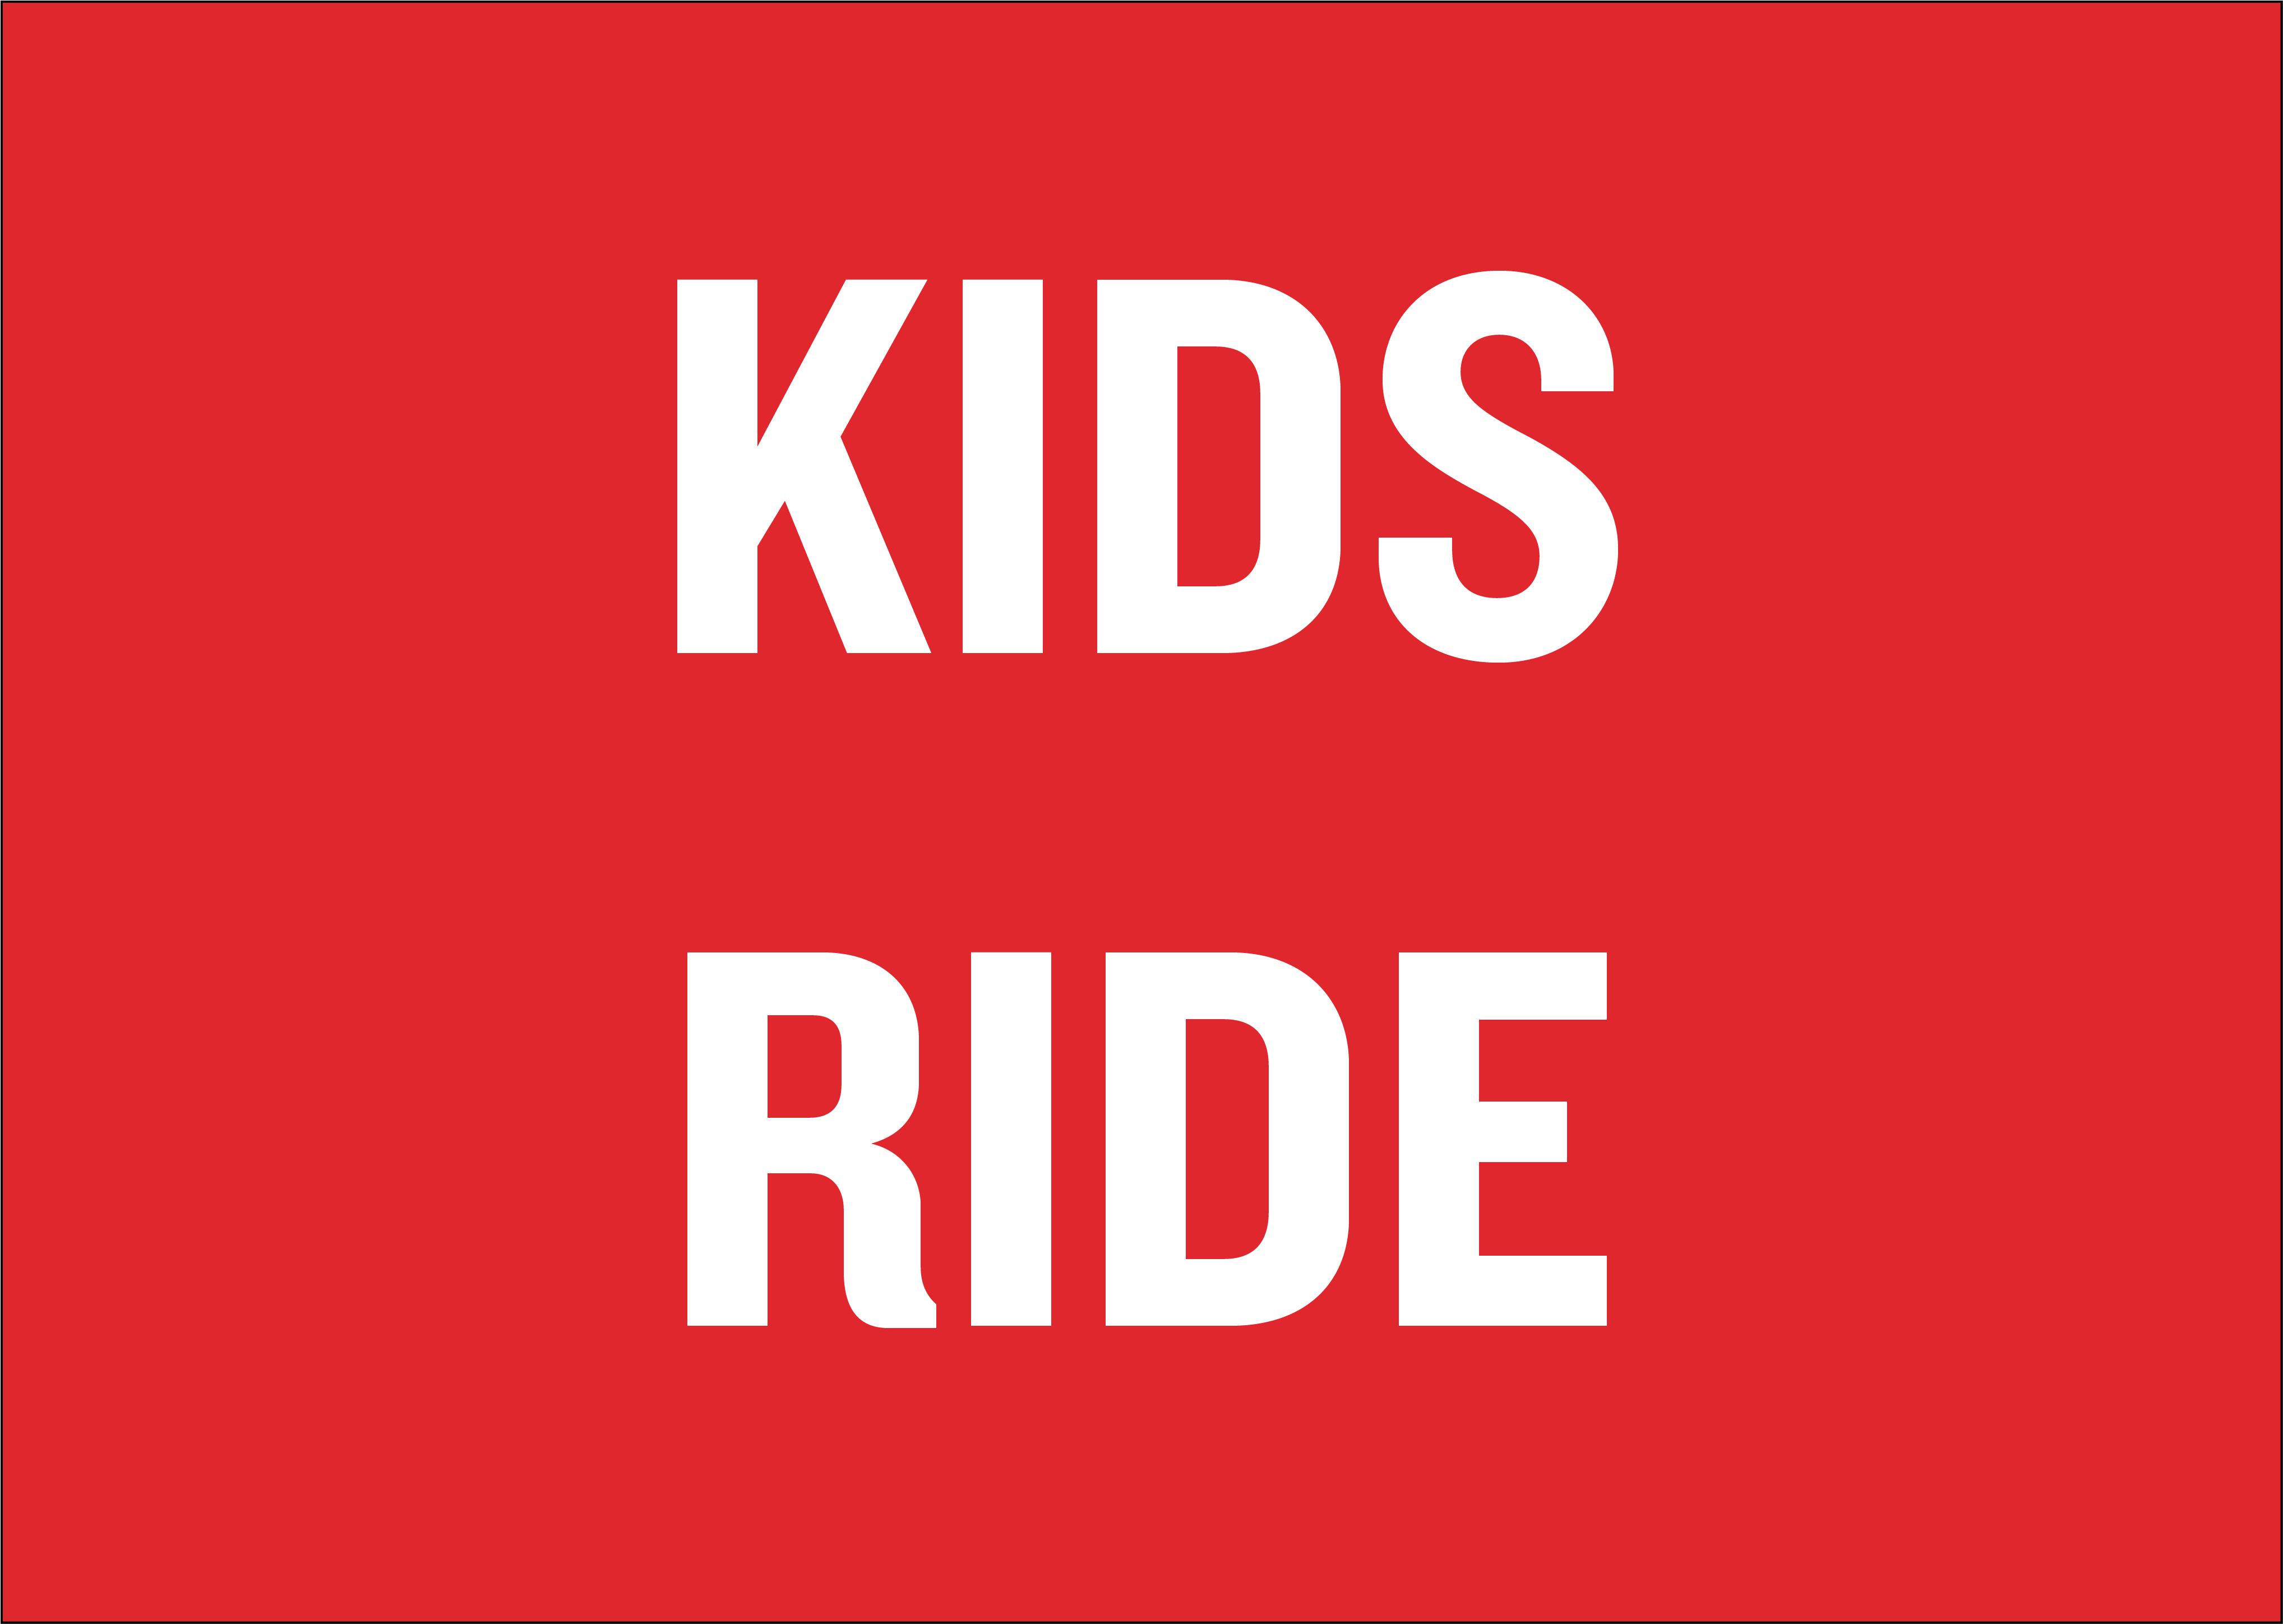 kidsrideicon